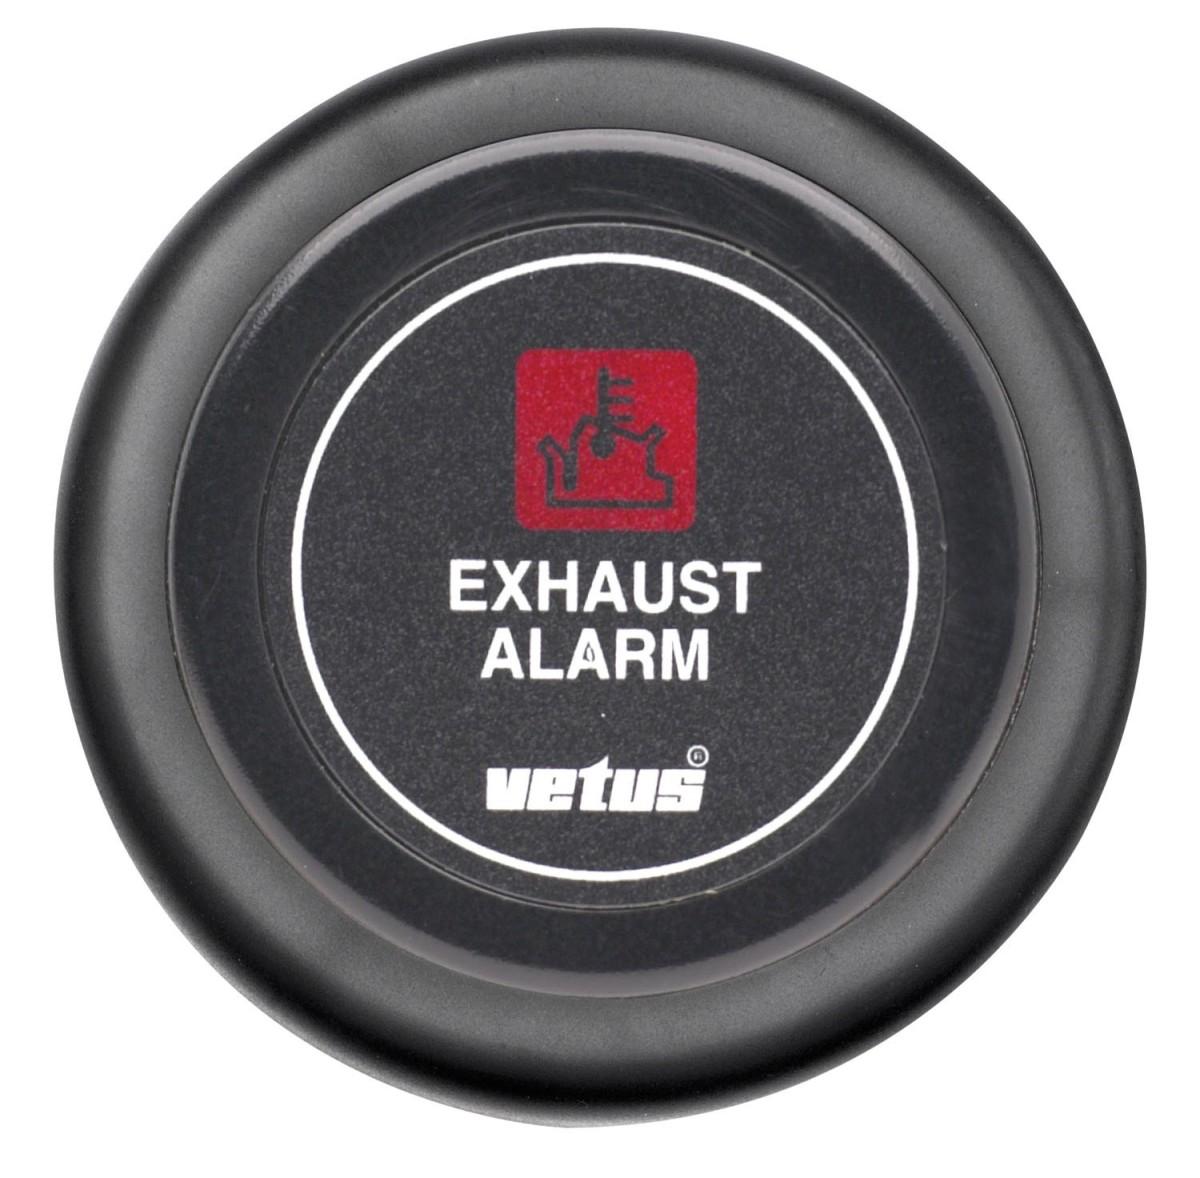 Vetus Maxwell Exhaust Alarm